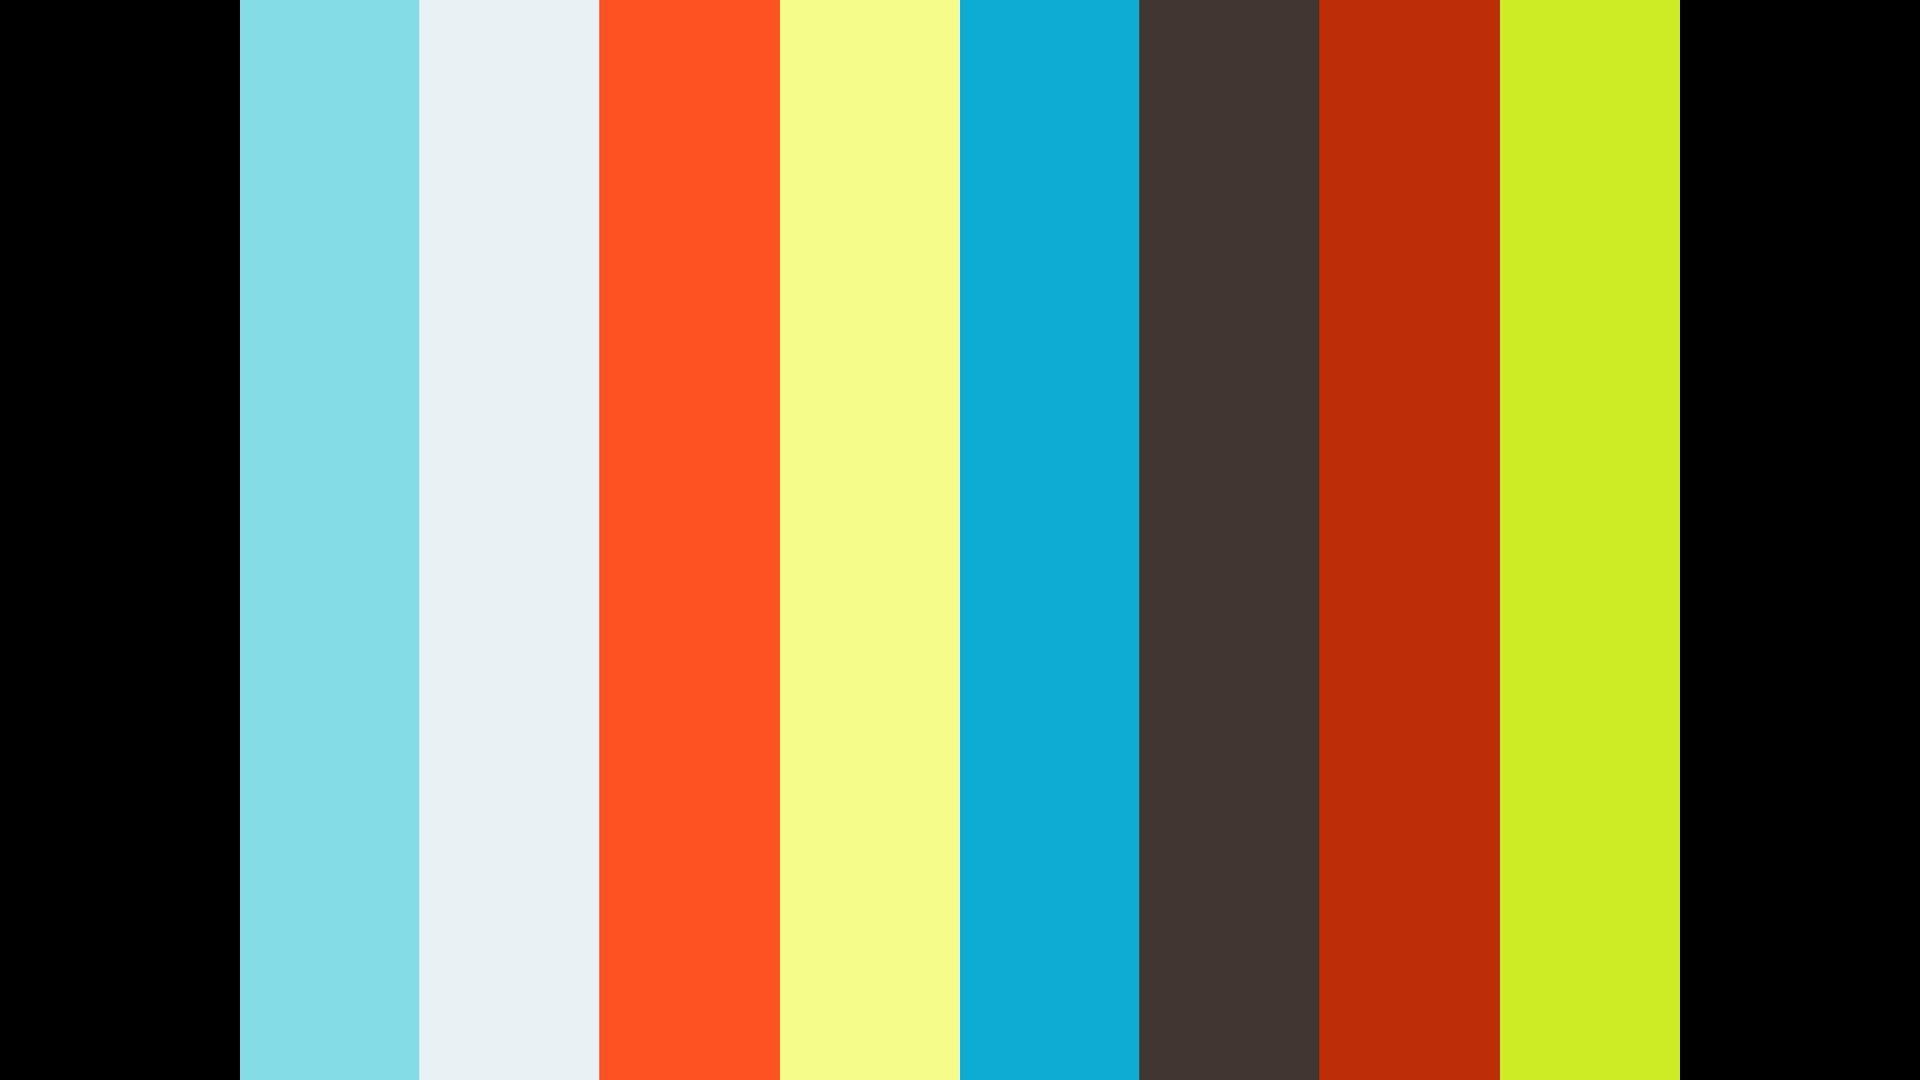 matali crasset - Concours Zéro Déchets 2019 - Syctom / Thema Design